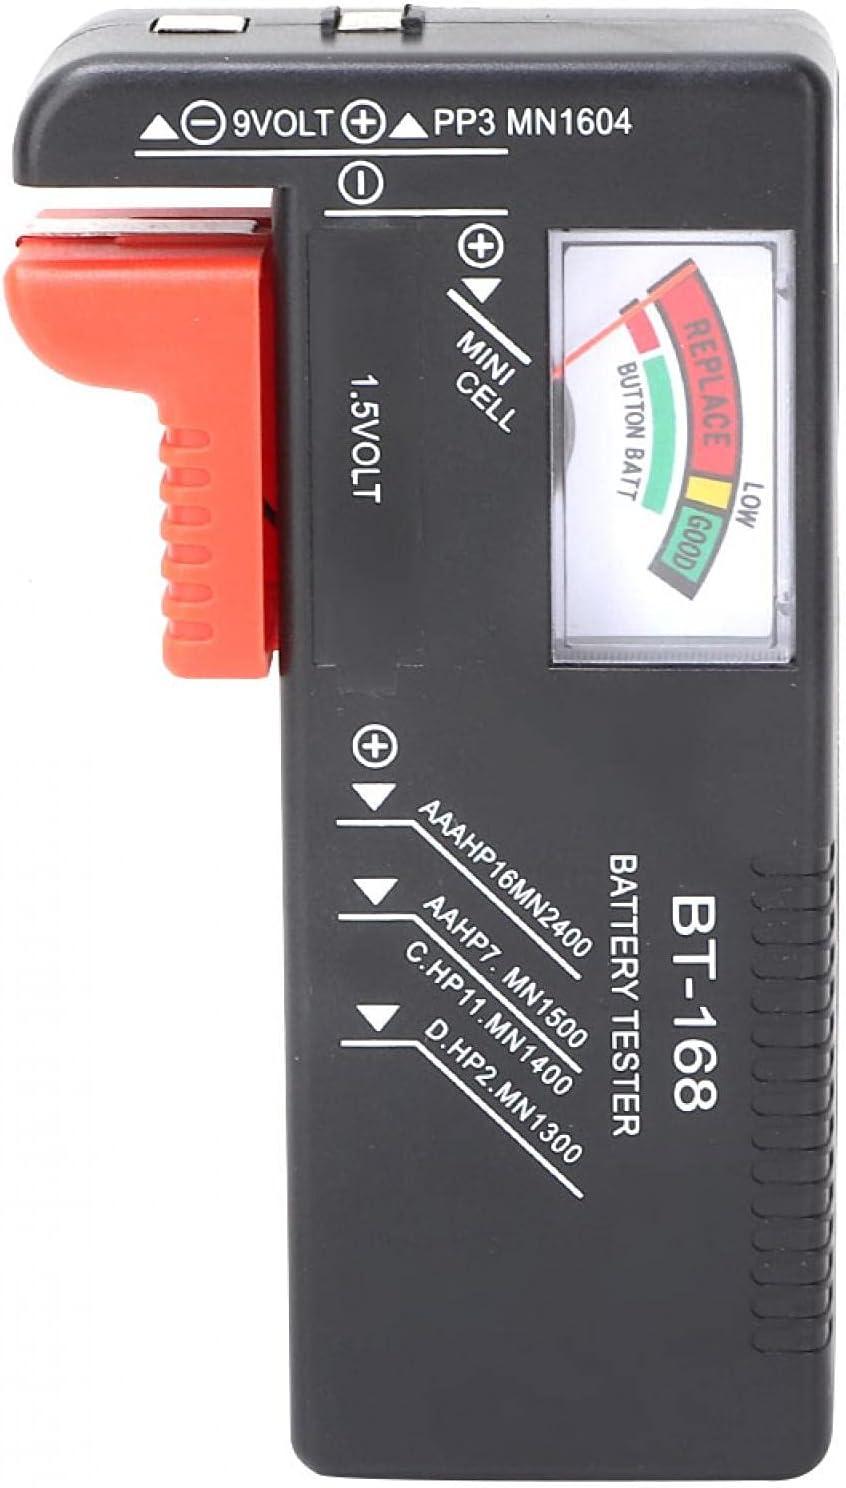 Digital Ranking TOP12 Max 88% OFF Battery Tester Volt Checker,BT-168